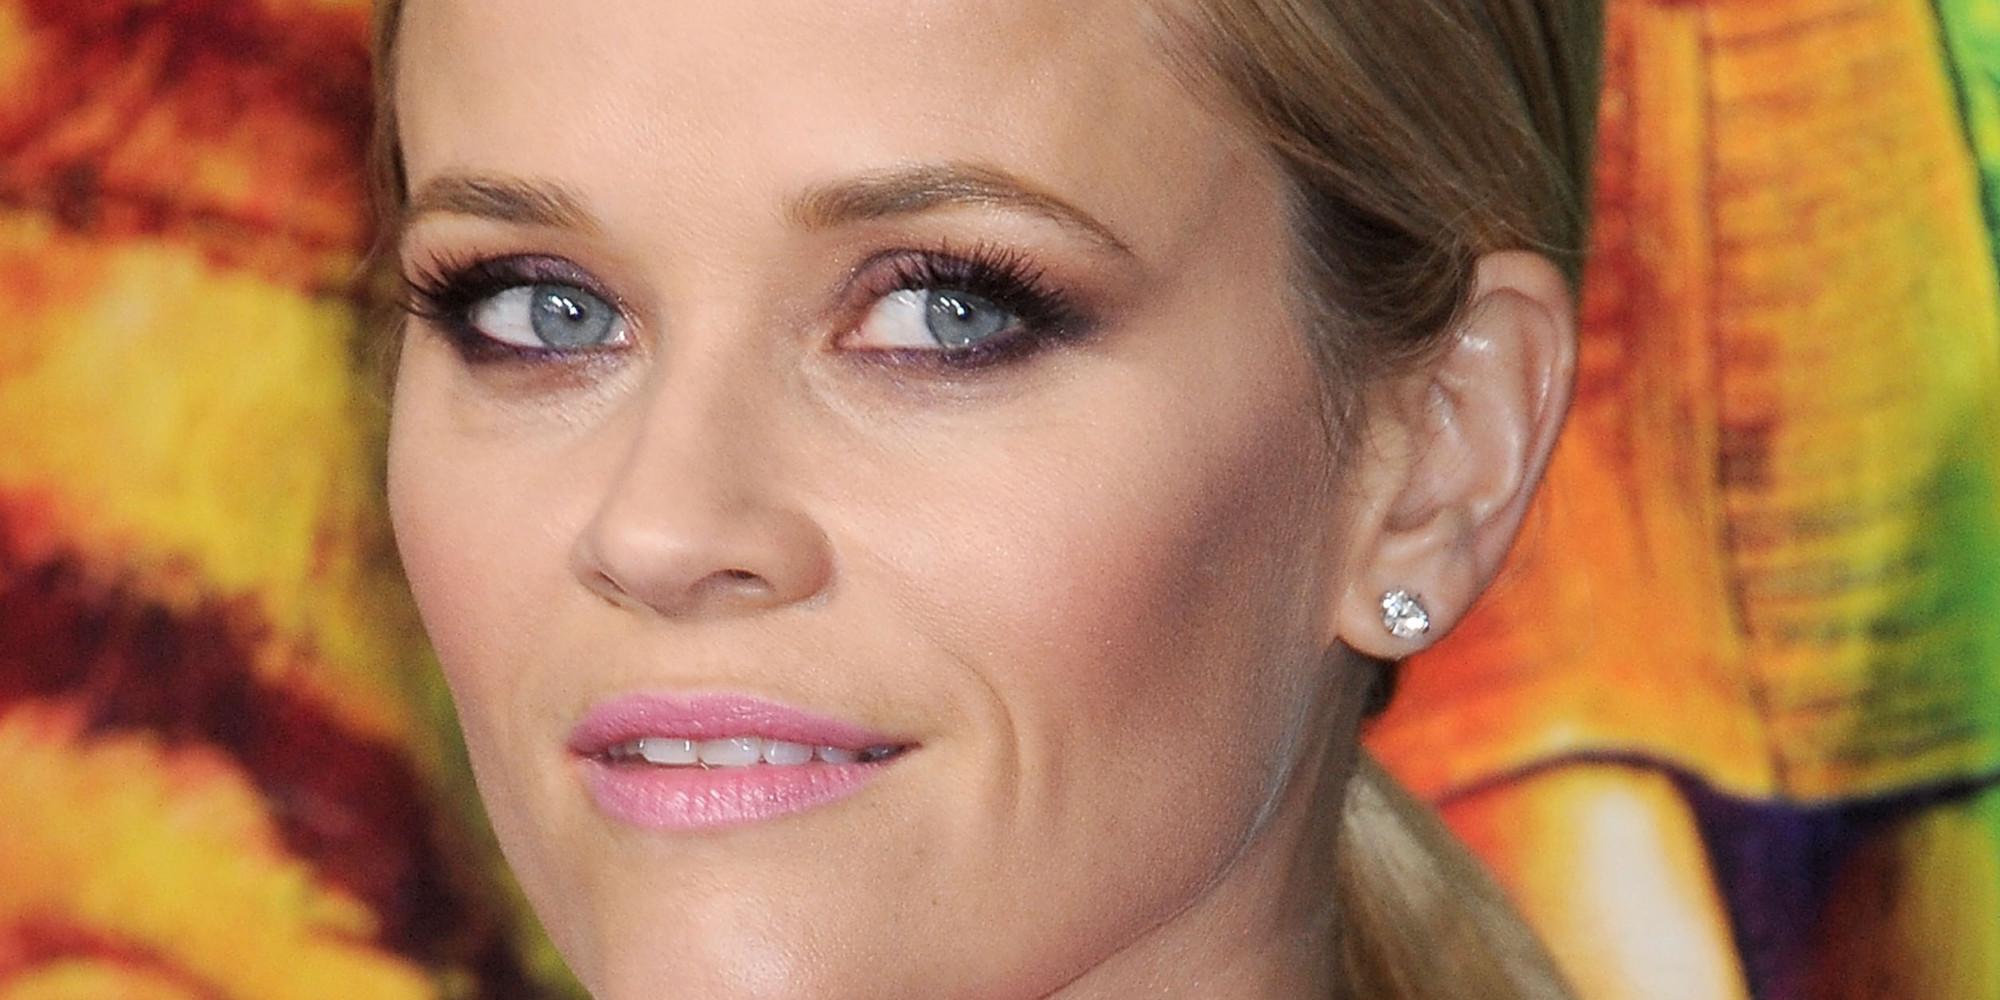 Reese Witherspoon S Smokey Eye Makeup Renders Us Speechless